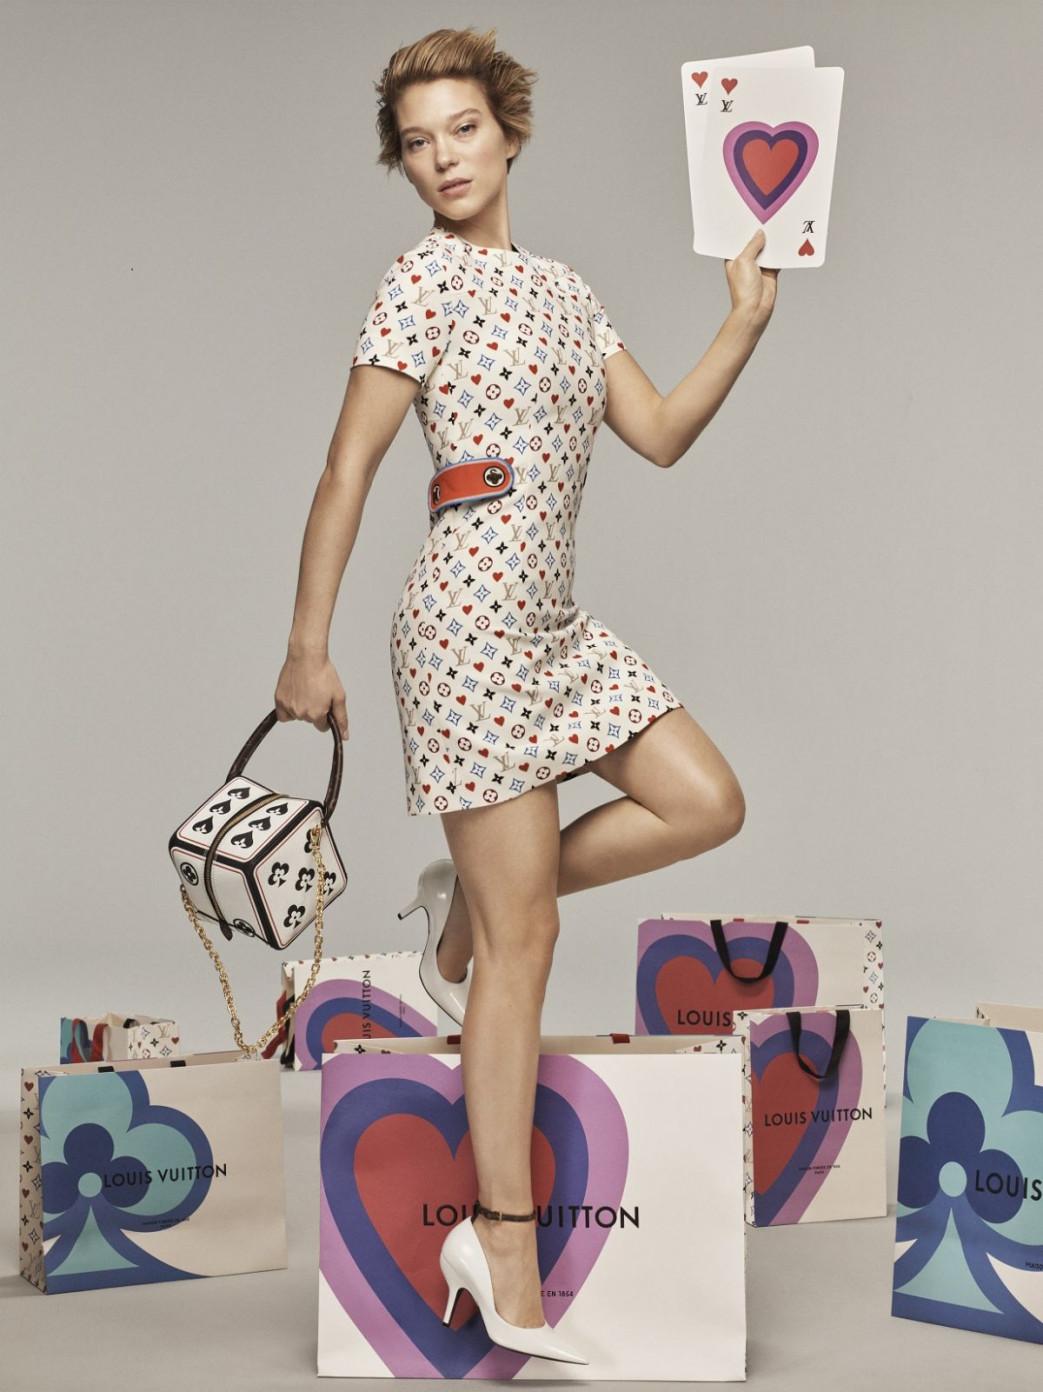 La Seydoux for Louis Vuitton Cruise 2021 Collection (